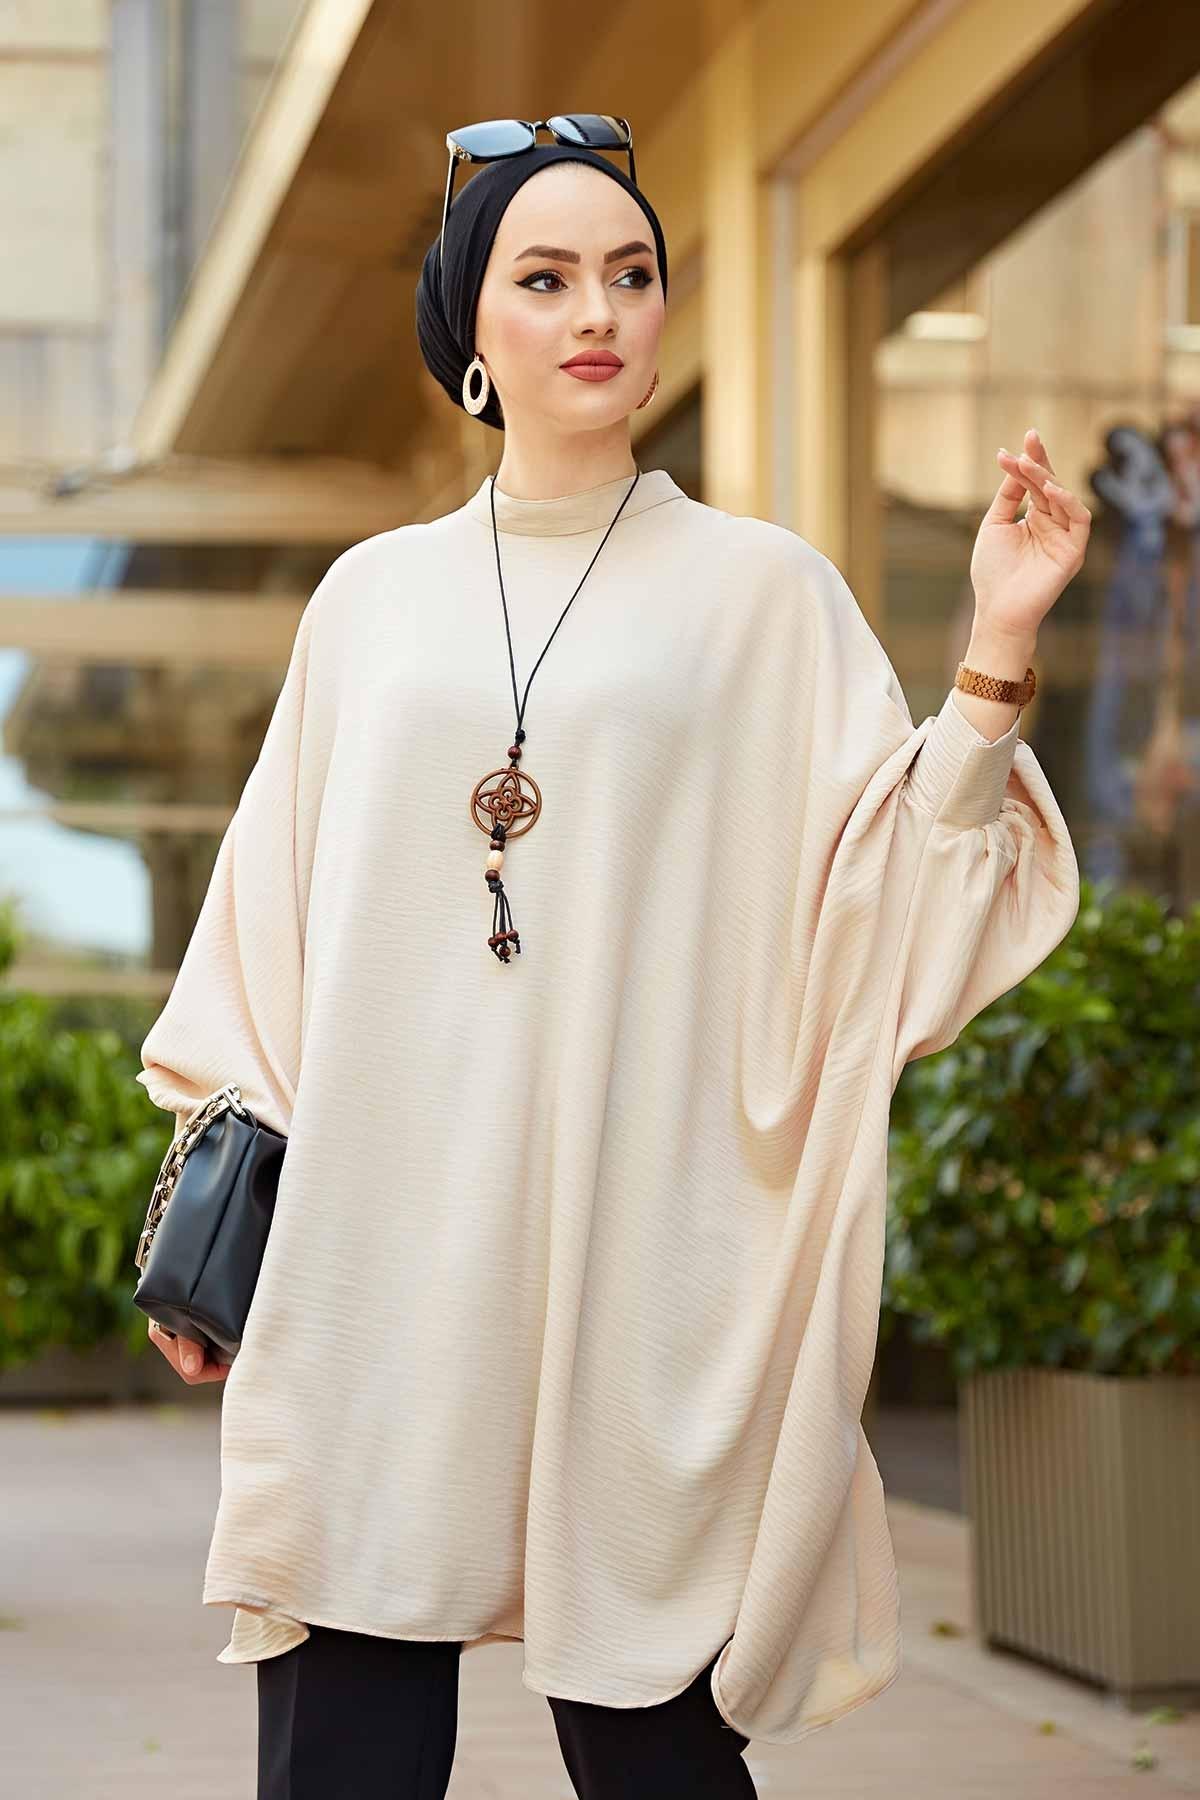 Bat Sleeve Aerobin Tunic Sleeve Elegant Shirt White Black Button Vintage Blouse Turn Down Collar Office Ladies Shirt Female Eid